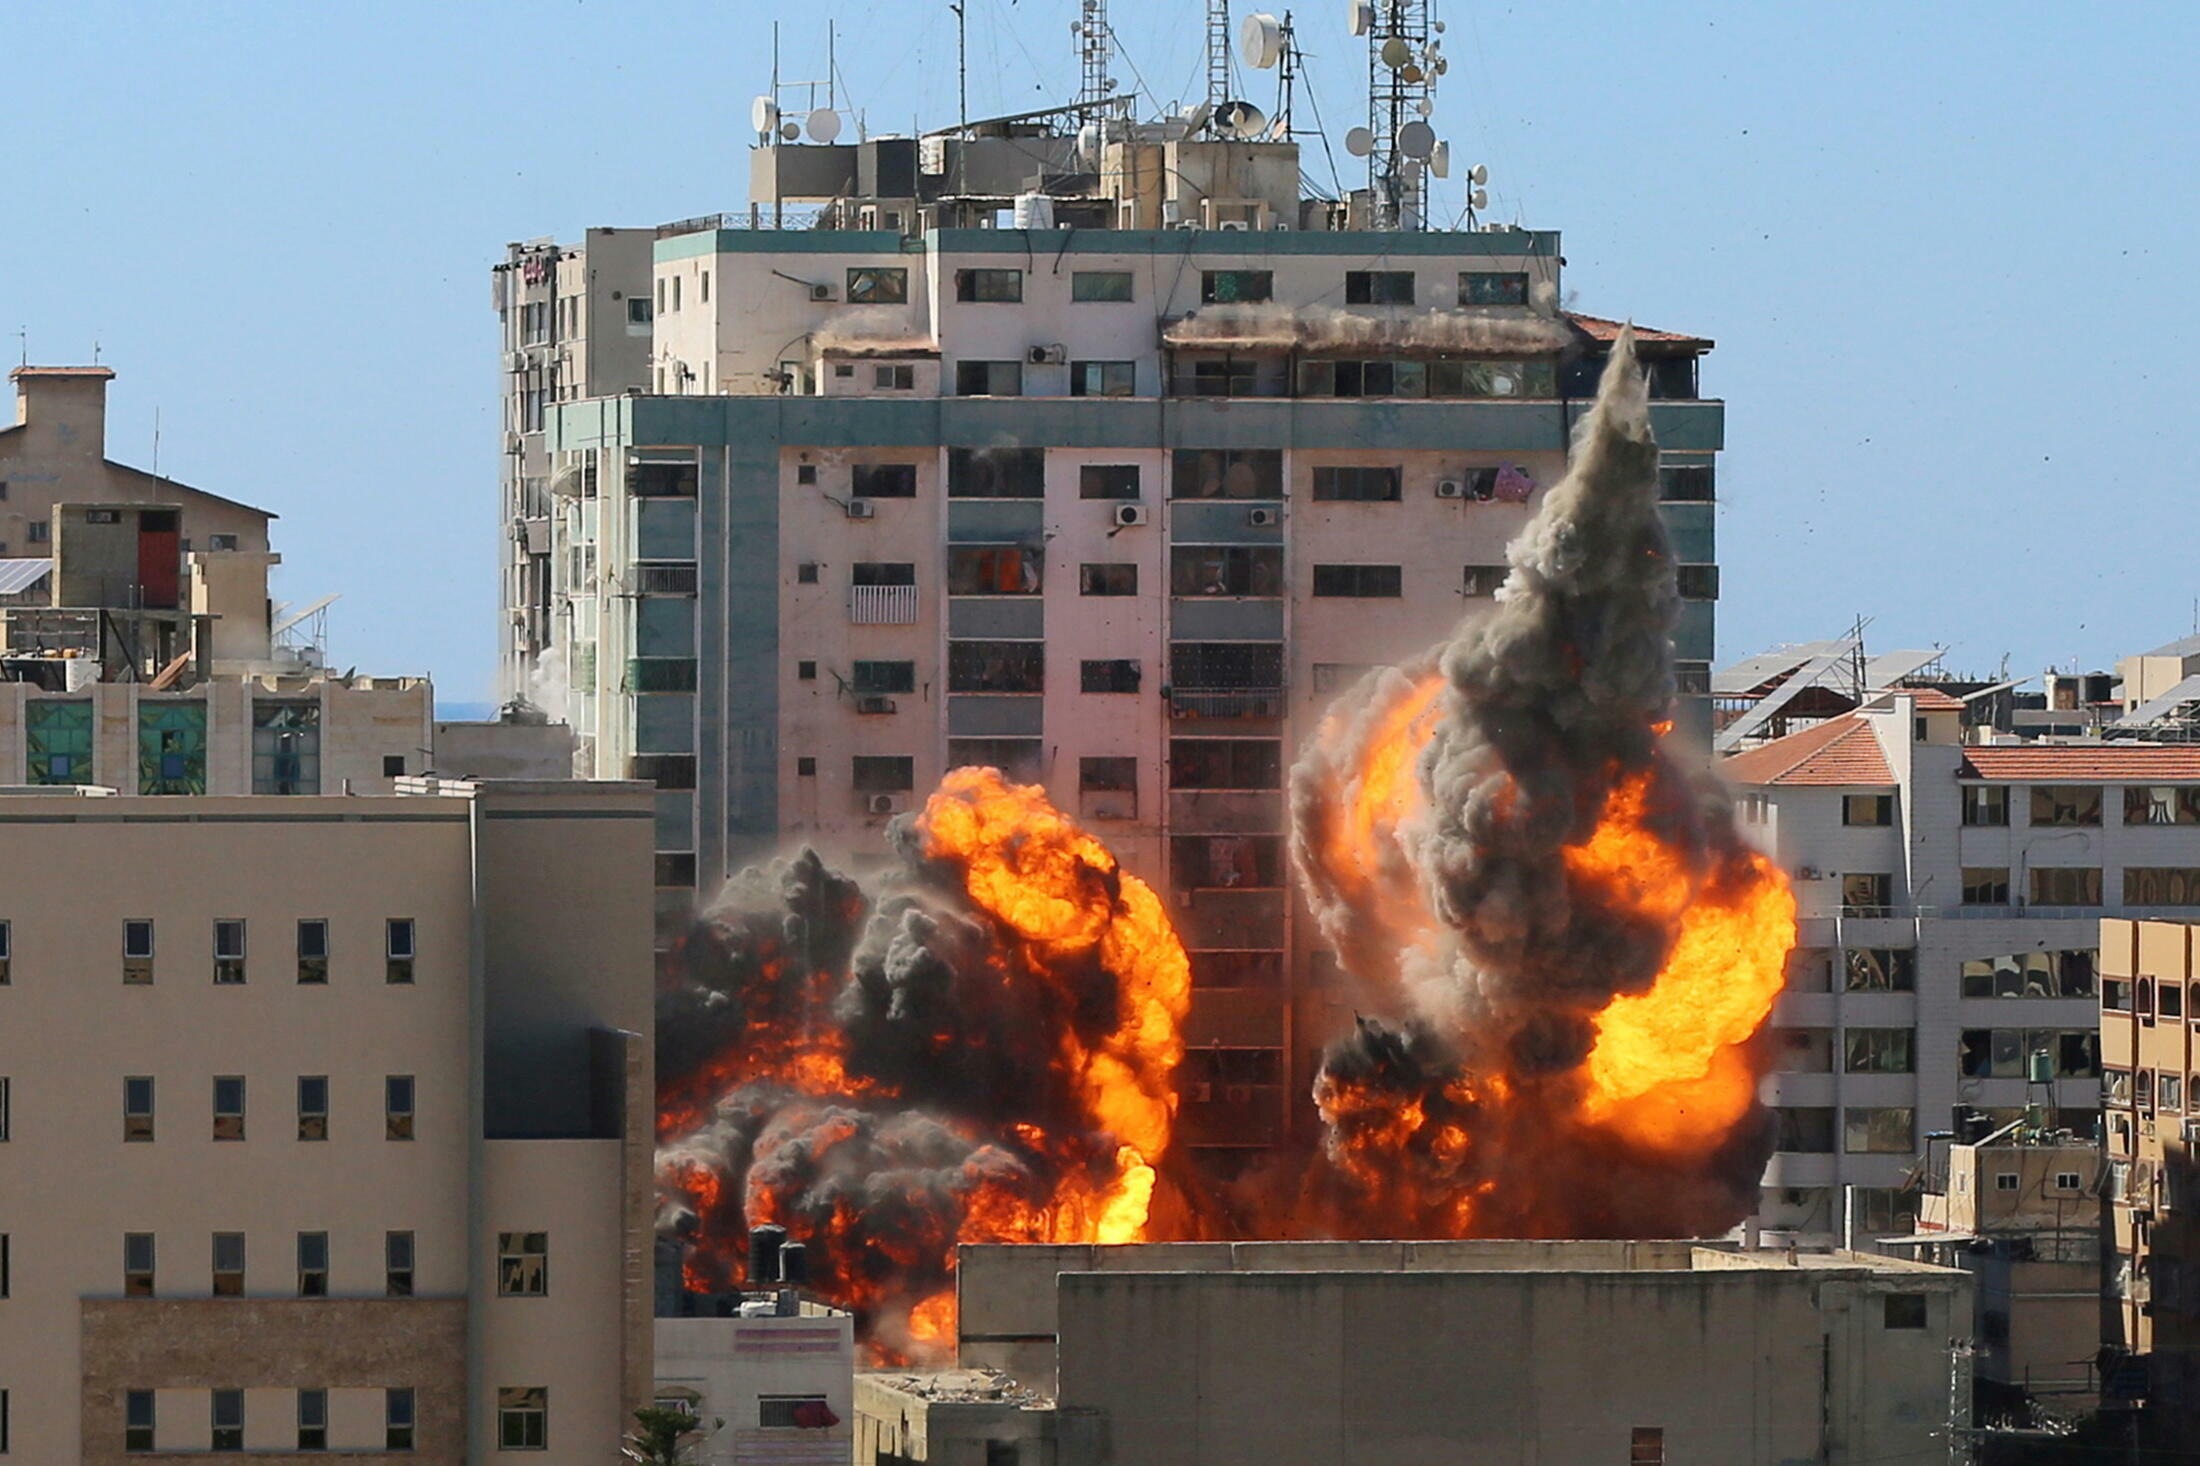 2021-05-15T153405Z_1781652569_RC2FGN97Z07T_RTRMADP_3_ISRAEL-PALESTINIANS-TOWER-MEDIA